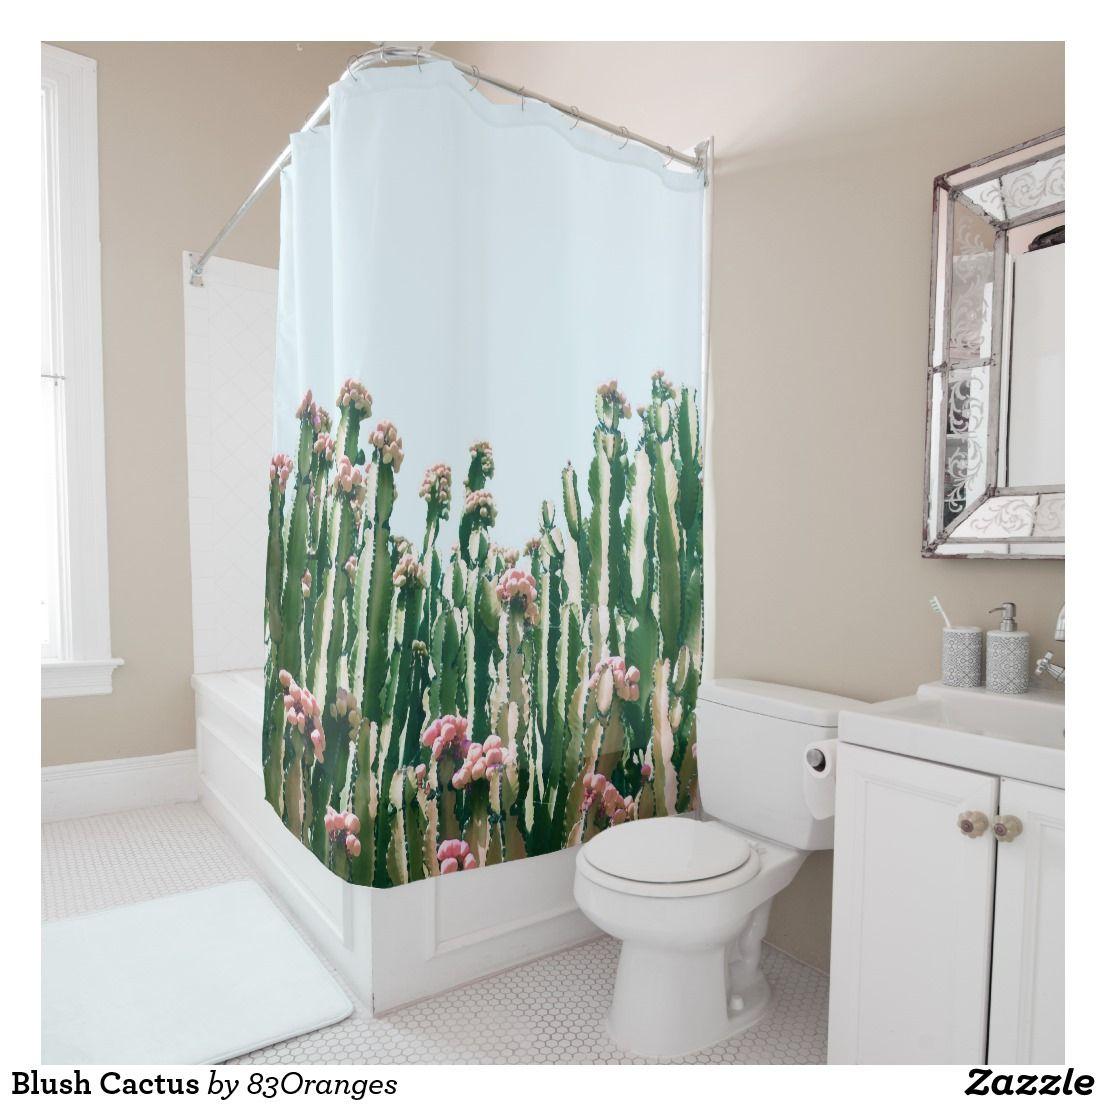 Blush Cactus Shower Curtain   Bath:Shower Curtains   Pinterest ...